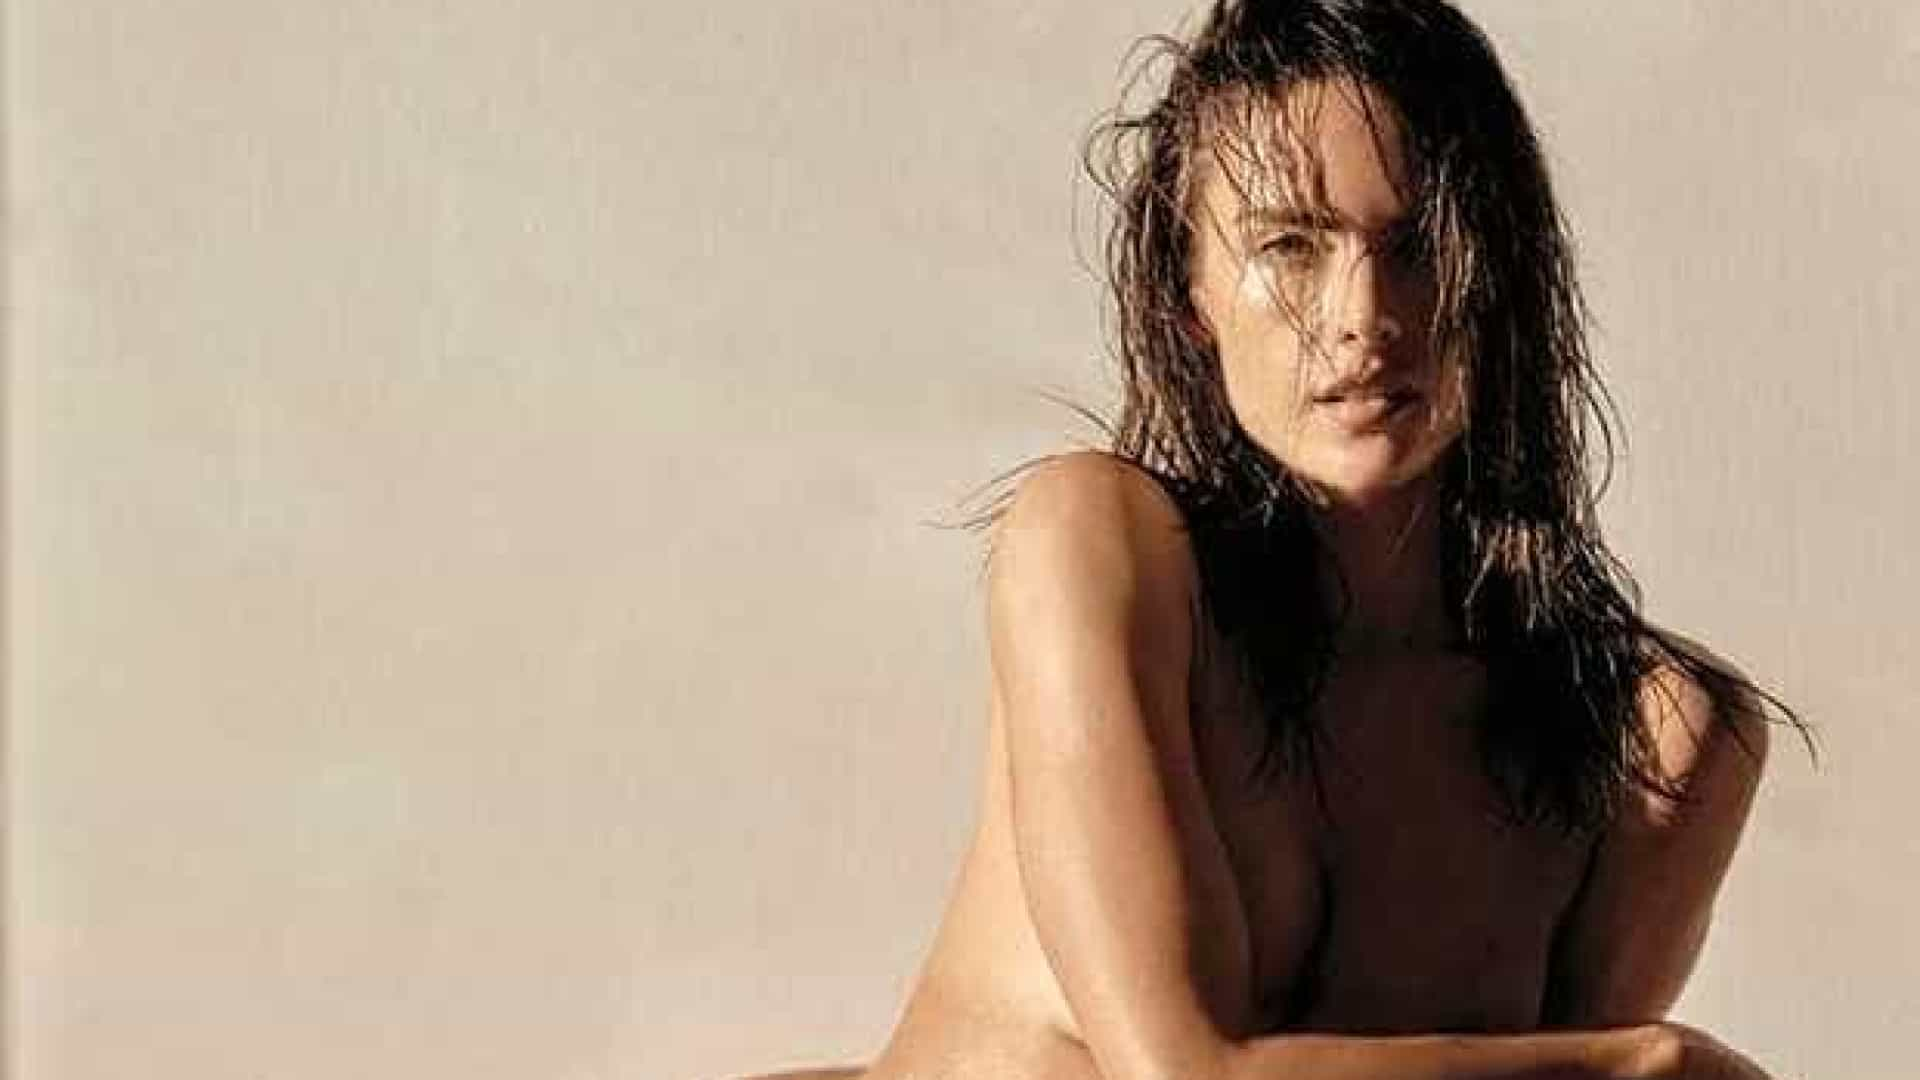 Nua, Alessandra Ambrosio 'incendeia' redes sociais